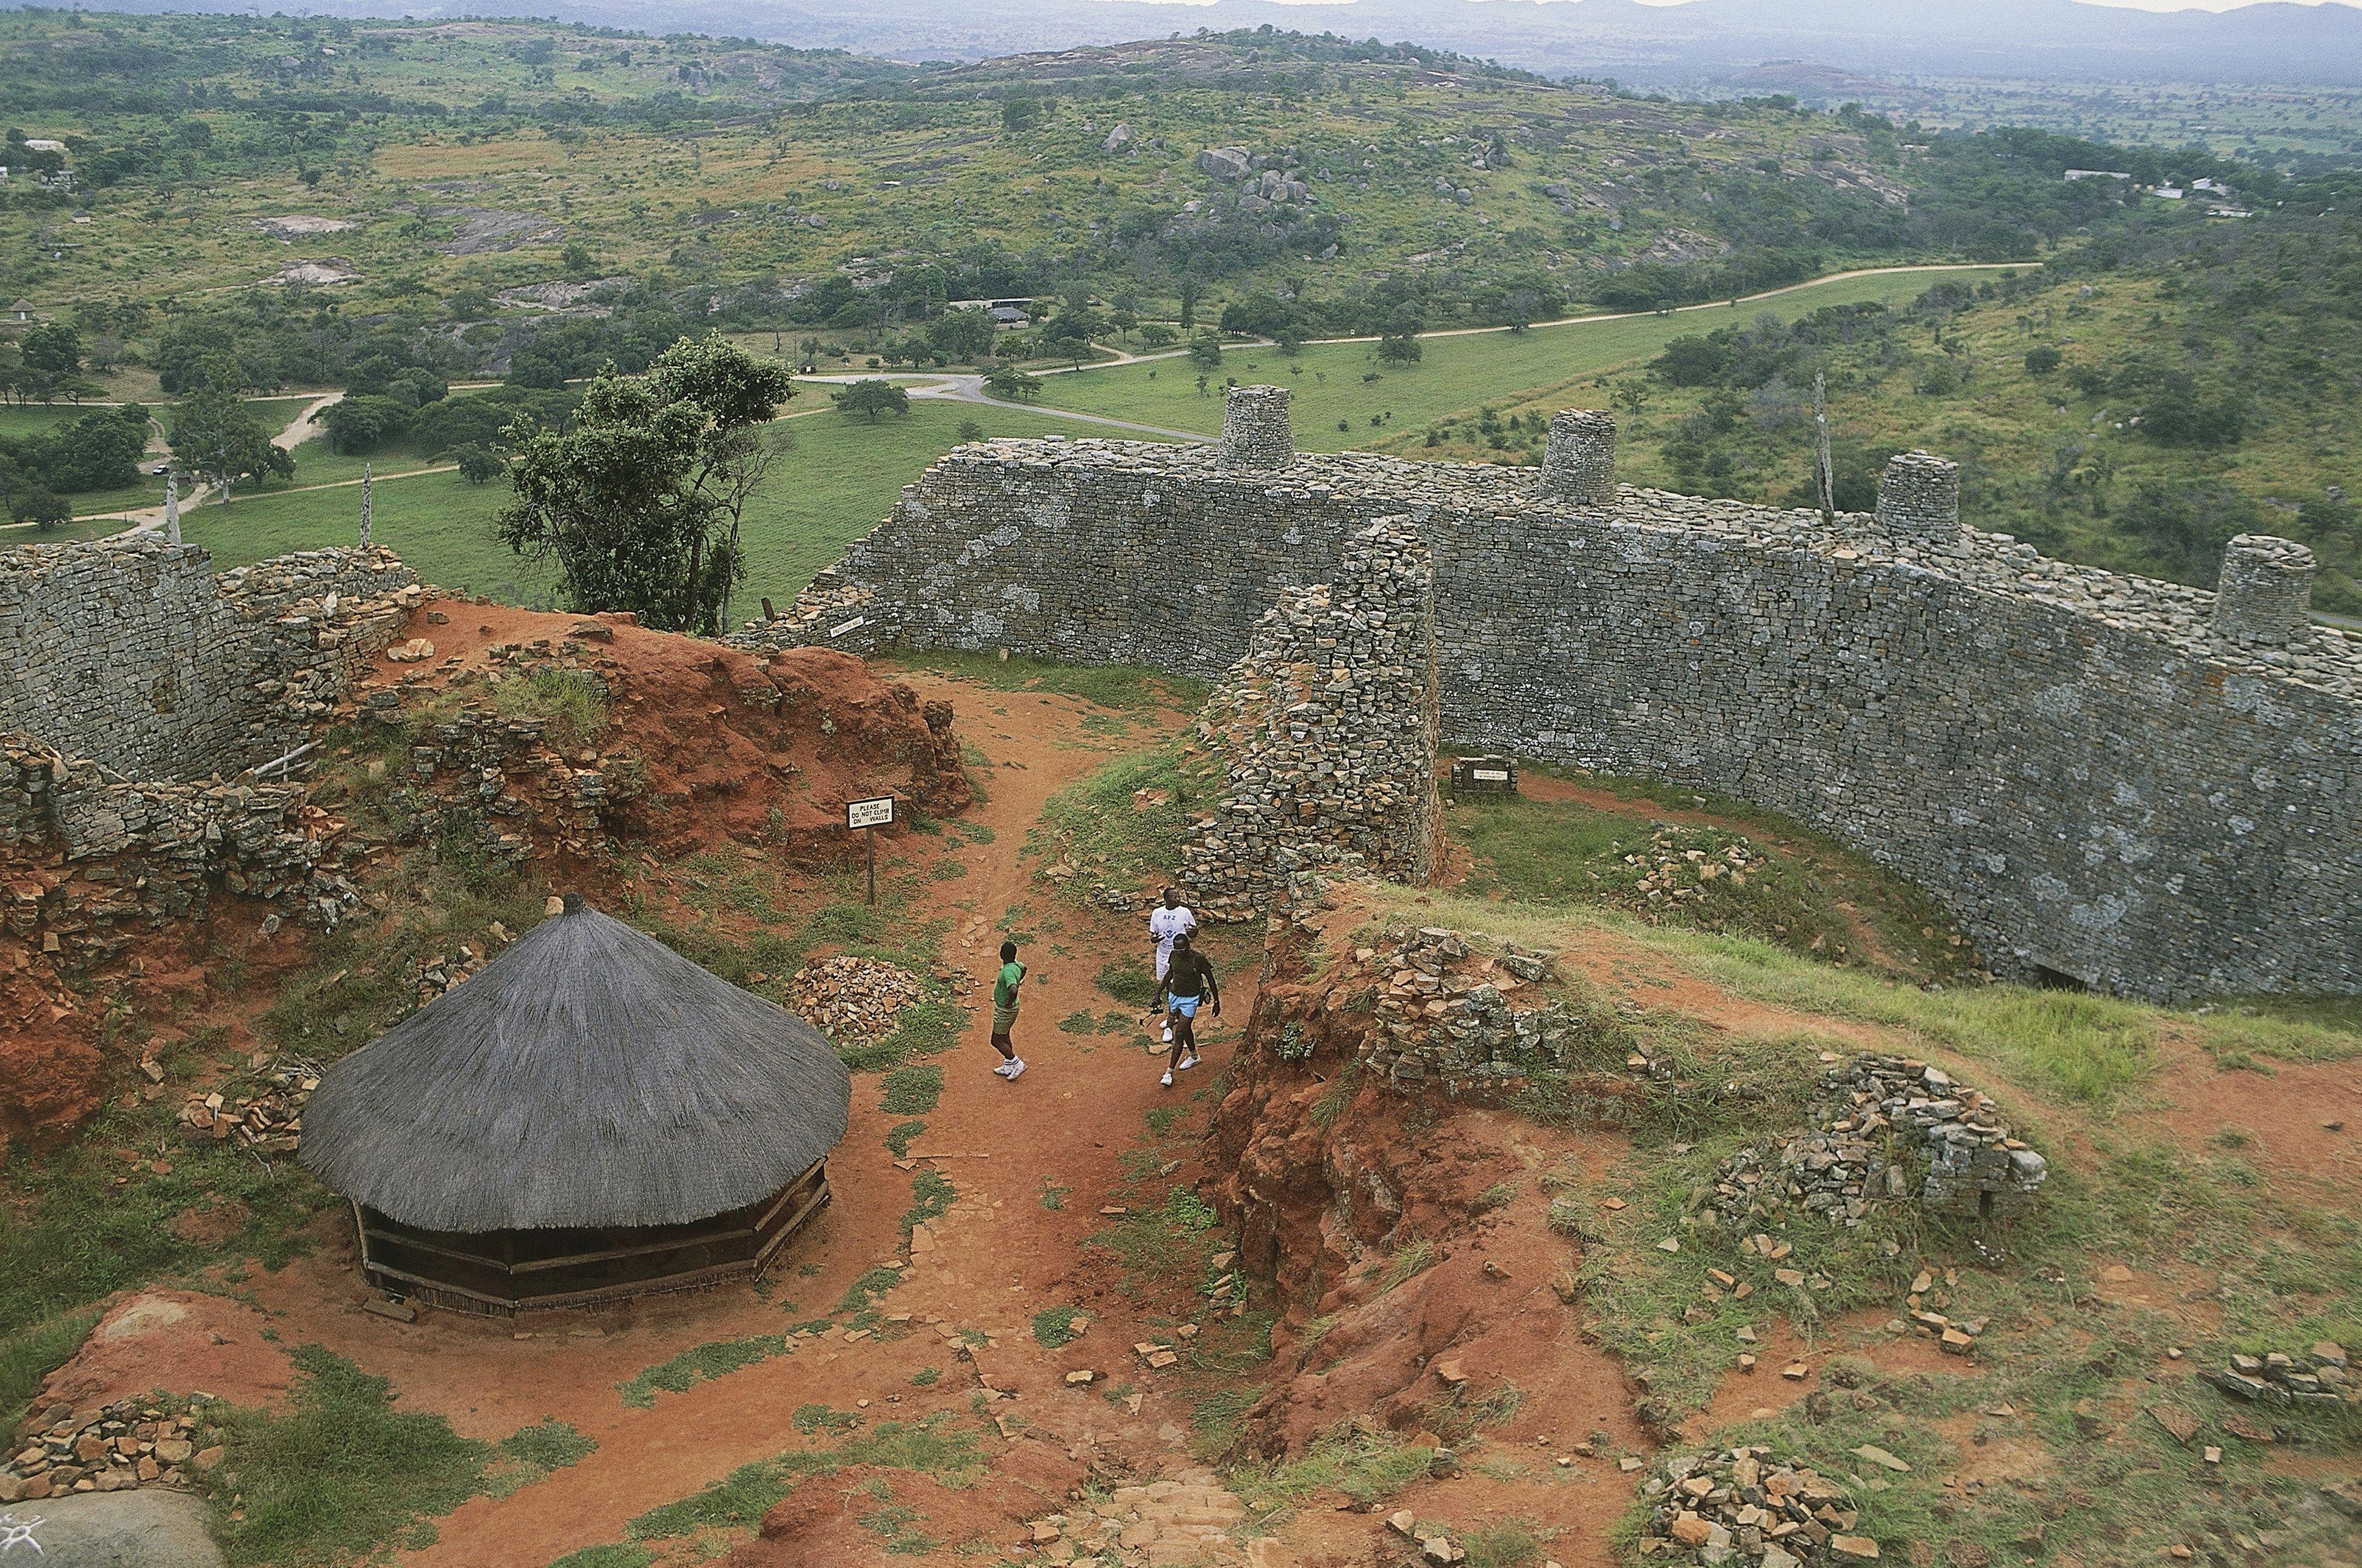 High angle view of ruins of a fortified wall, Great Zimbabwe, Zimbabwe